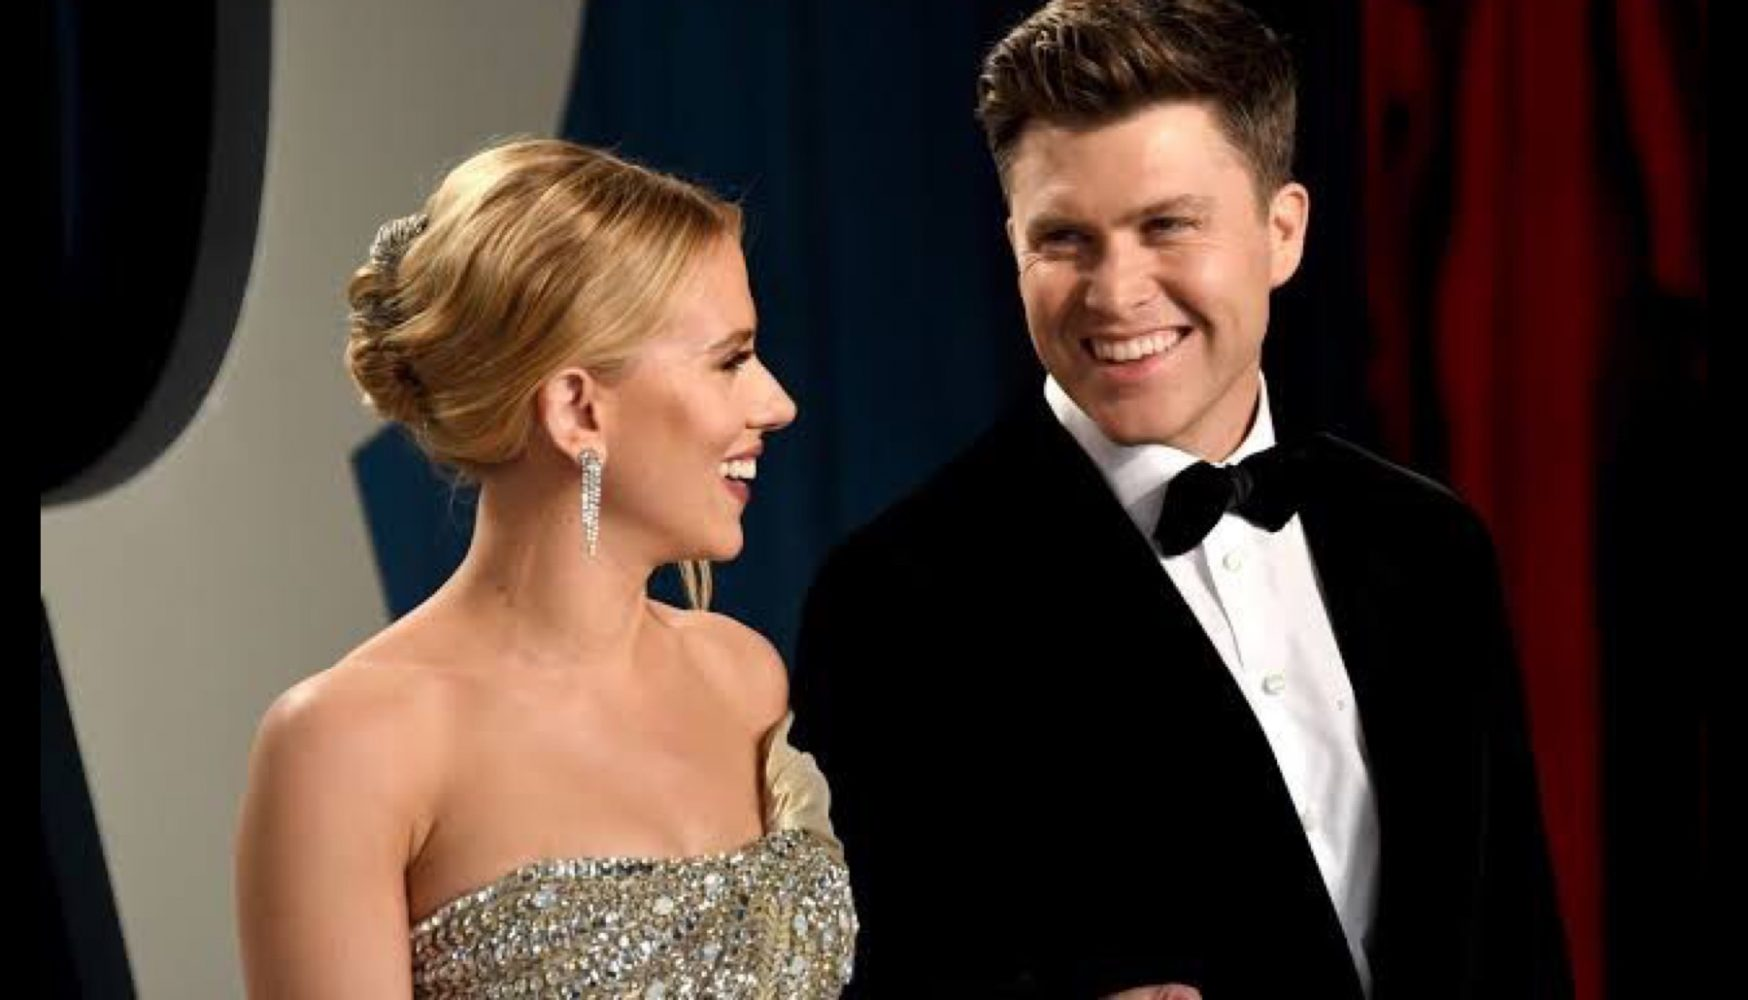 Scarlette Johansson y Colin Jost